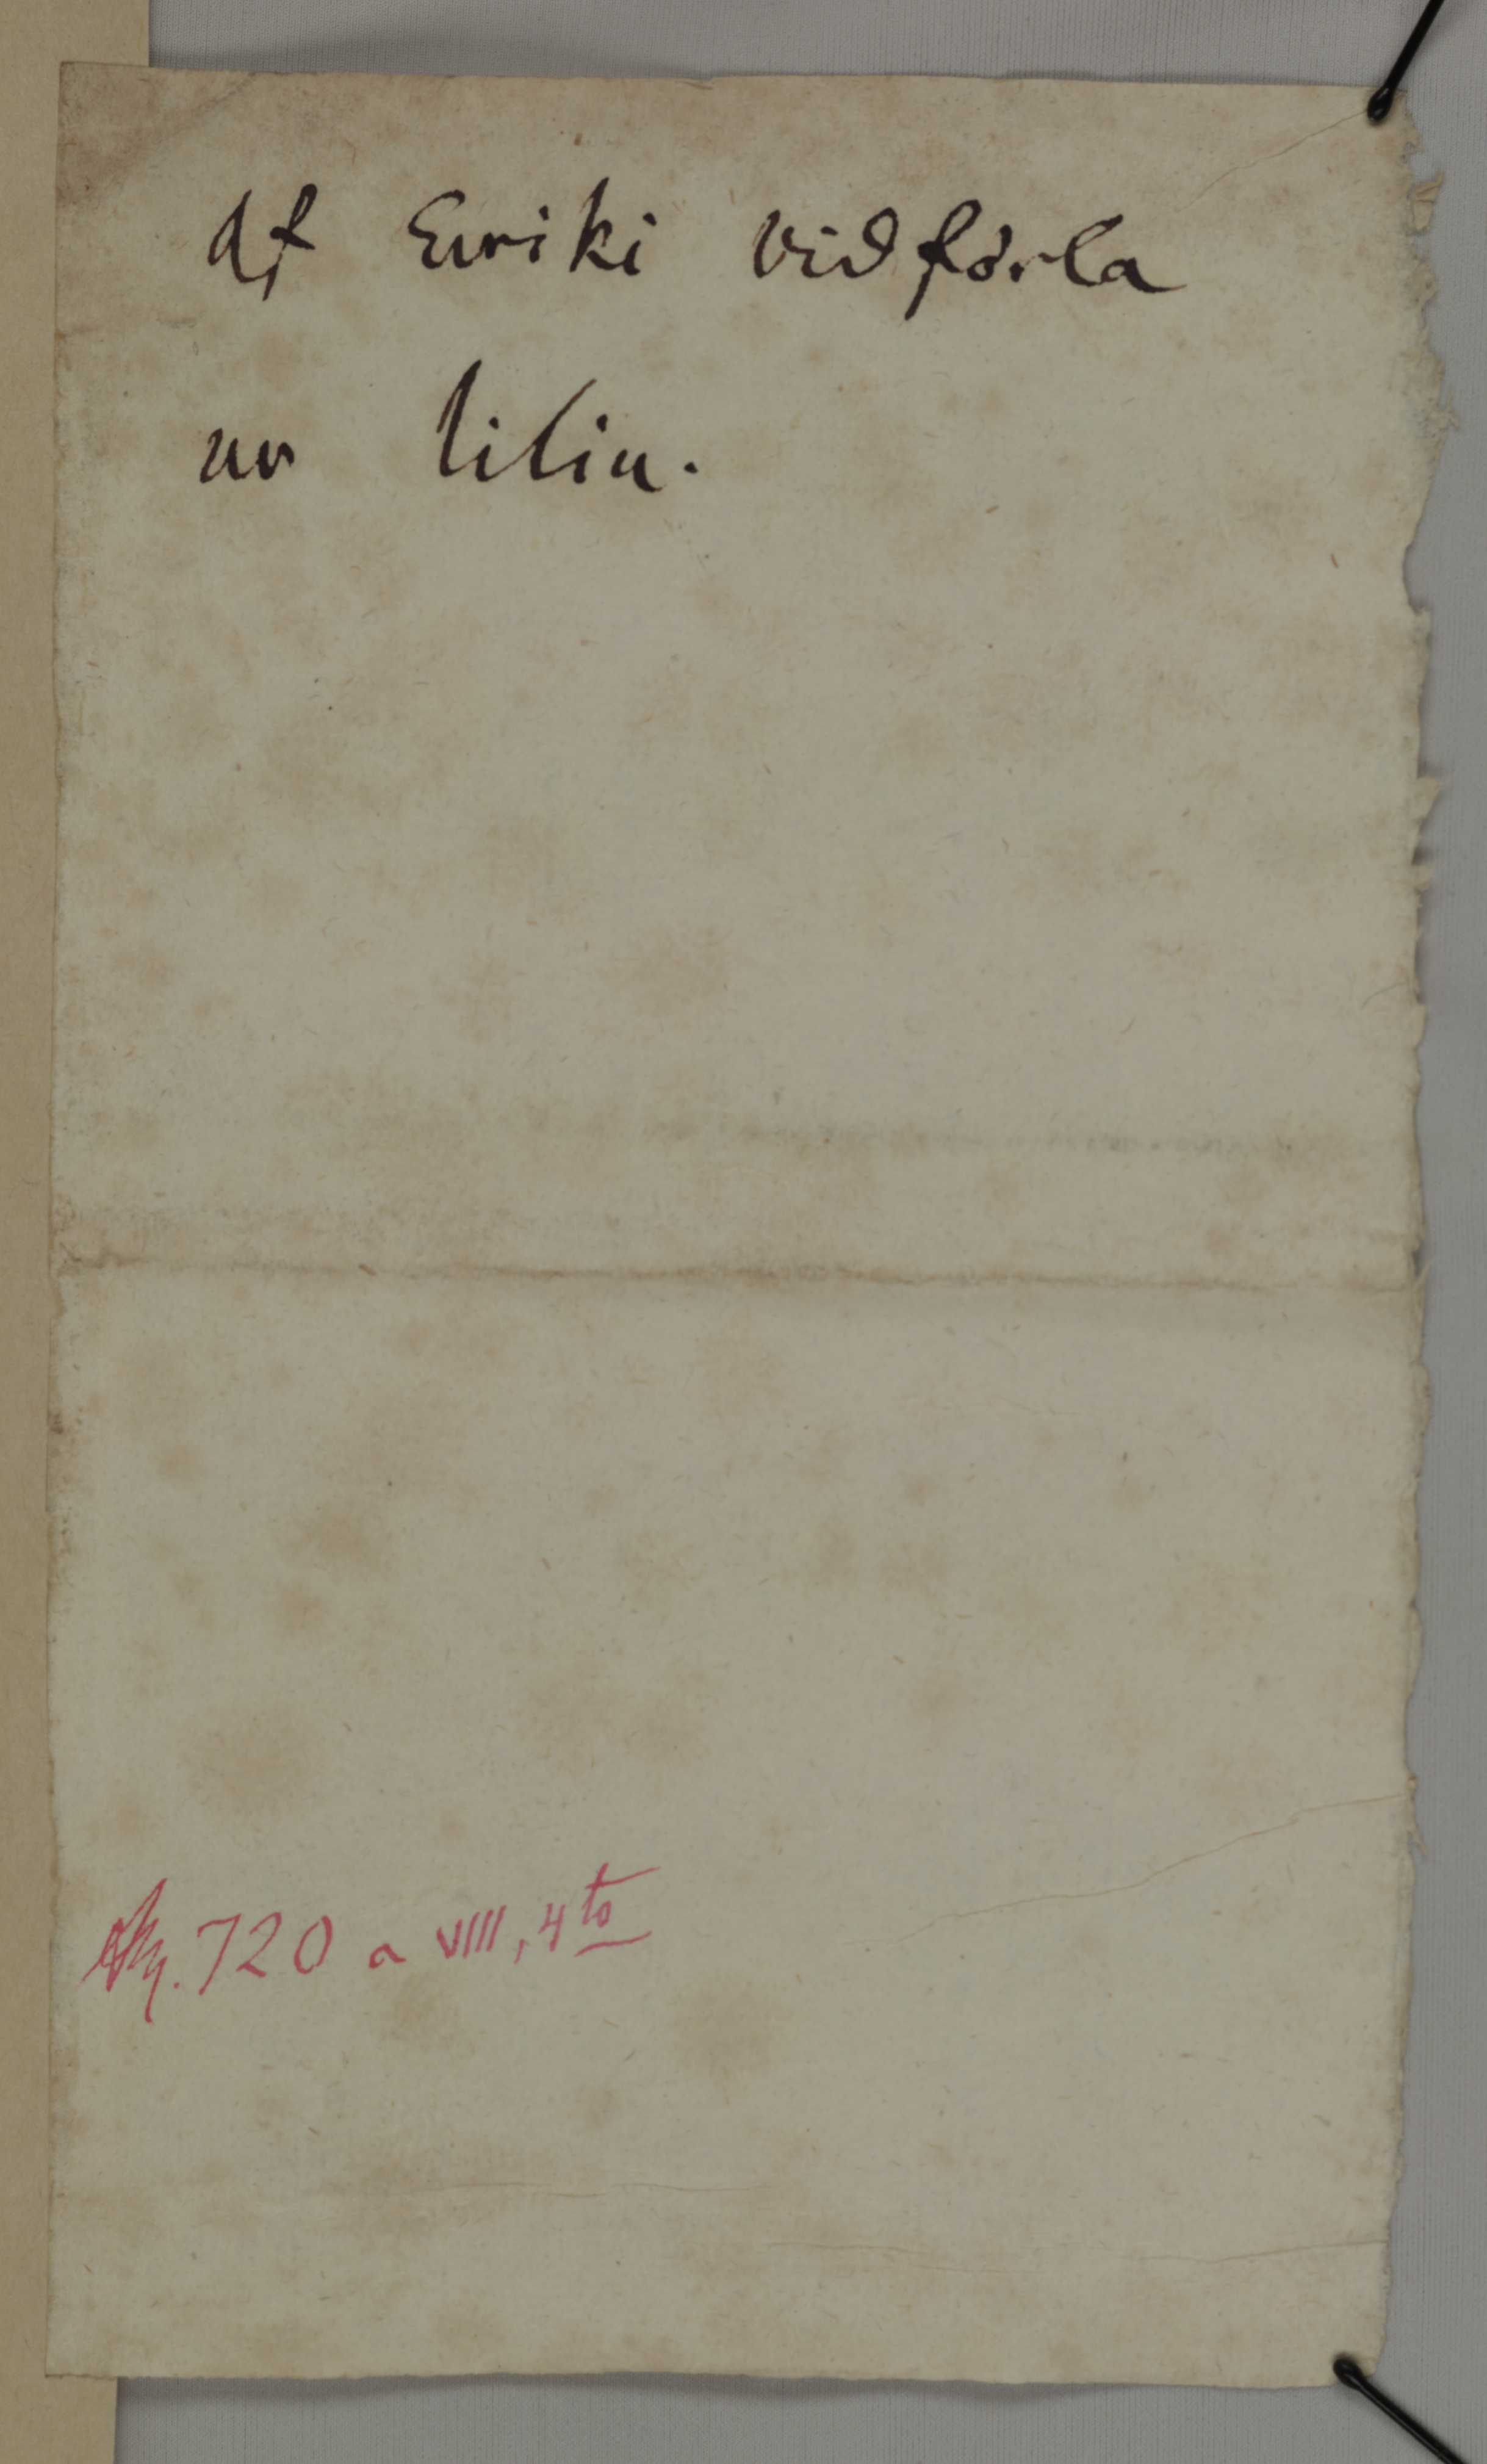 AM 720 a VIII 4° - accMat01